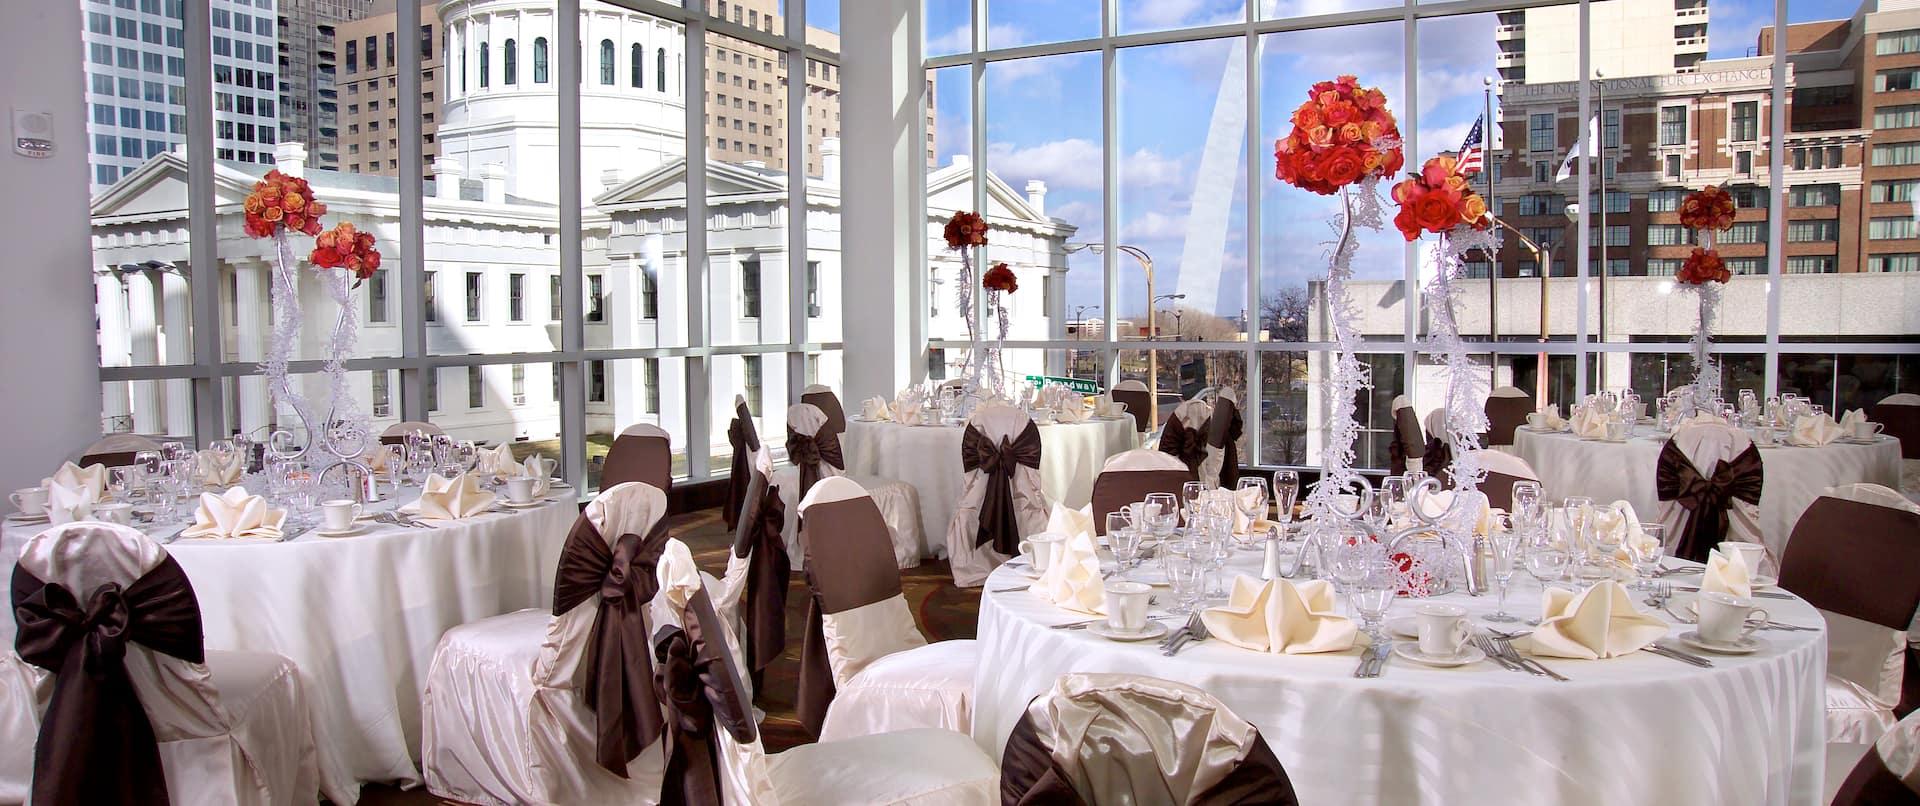 Arch View Ballroom